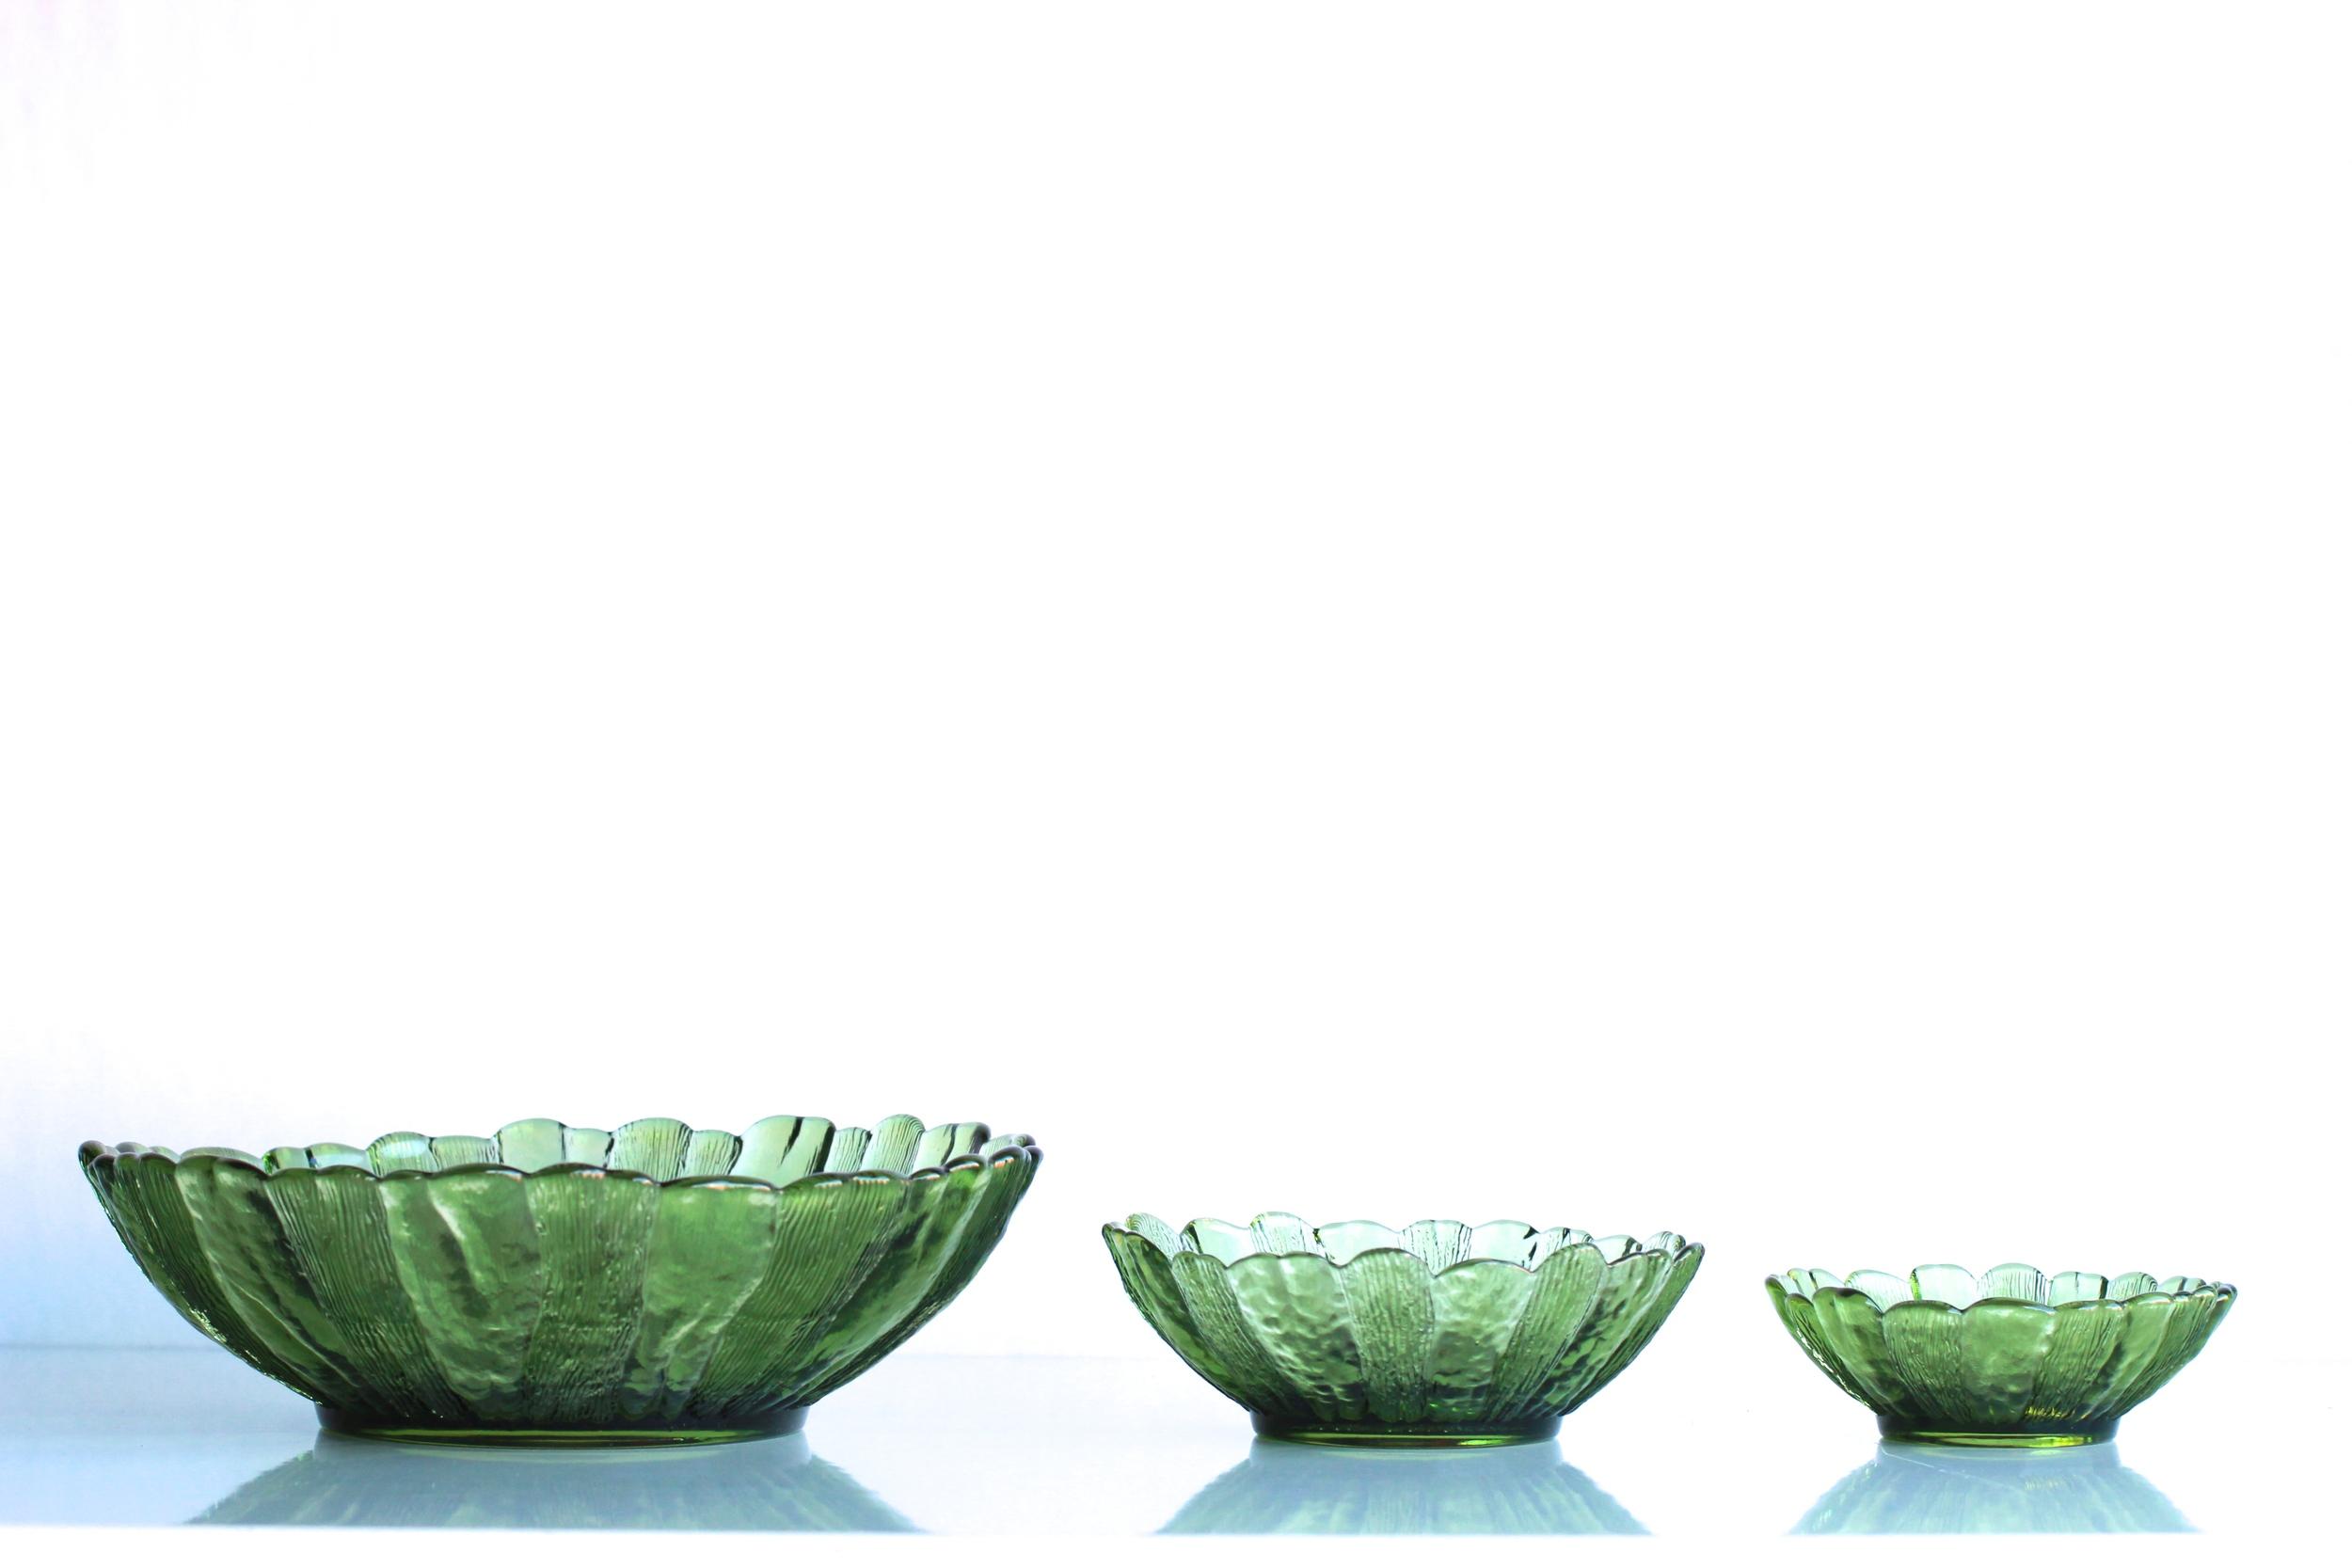 Green Glass Serving Bowls